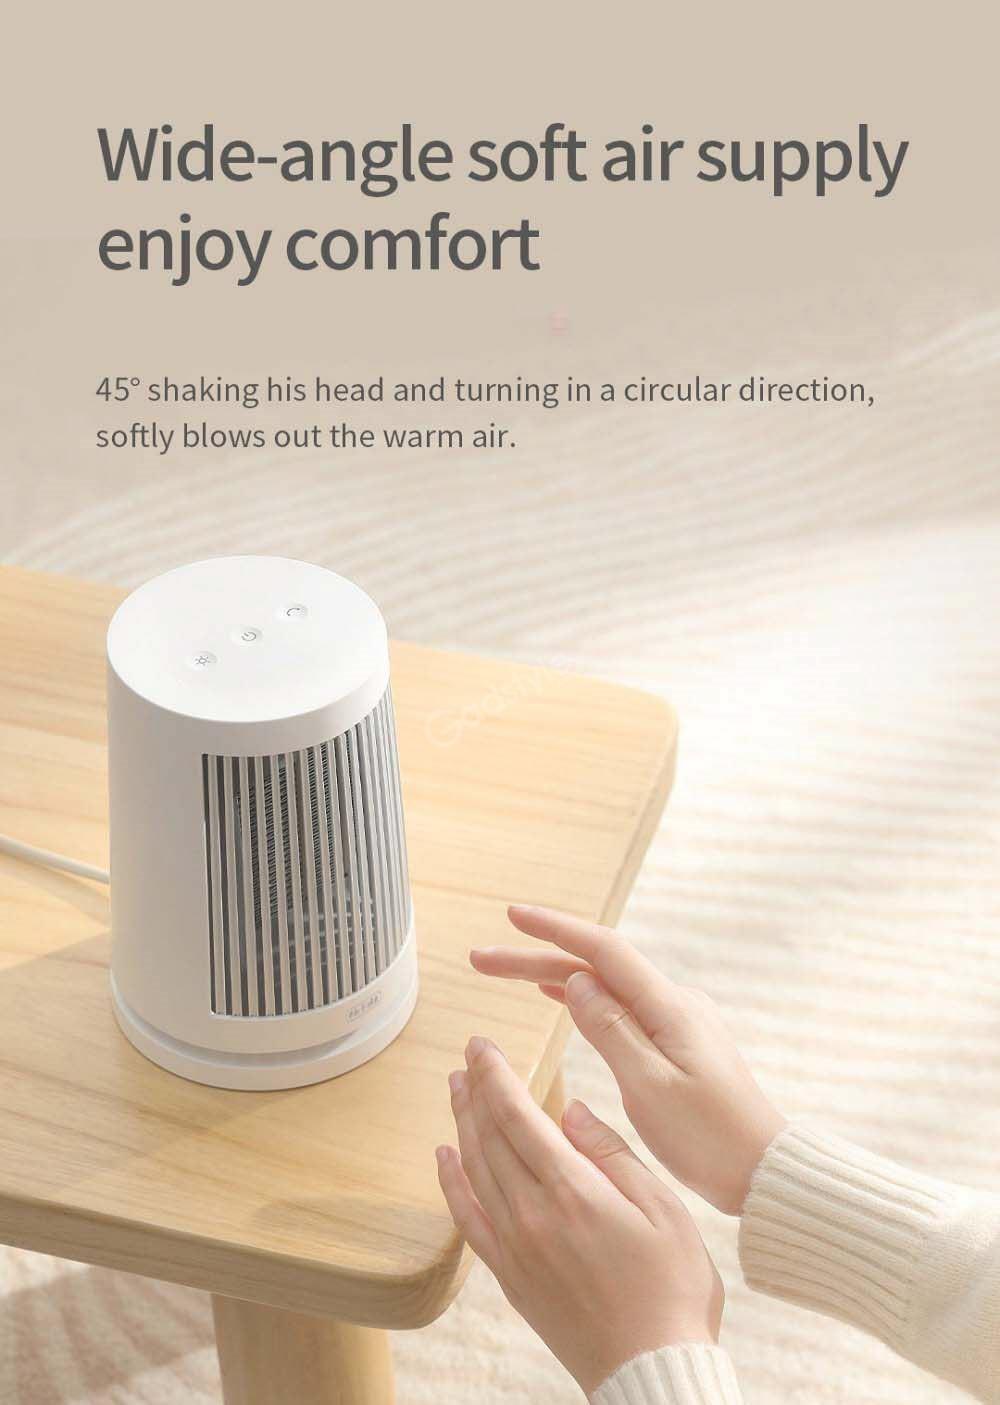 Xiaomi Mijia 600w Ptc Heating Desktop Electric Heater (6)